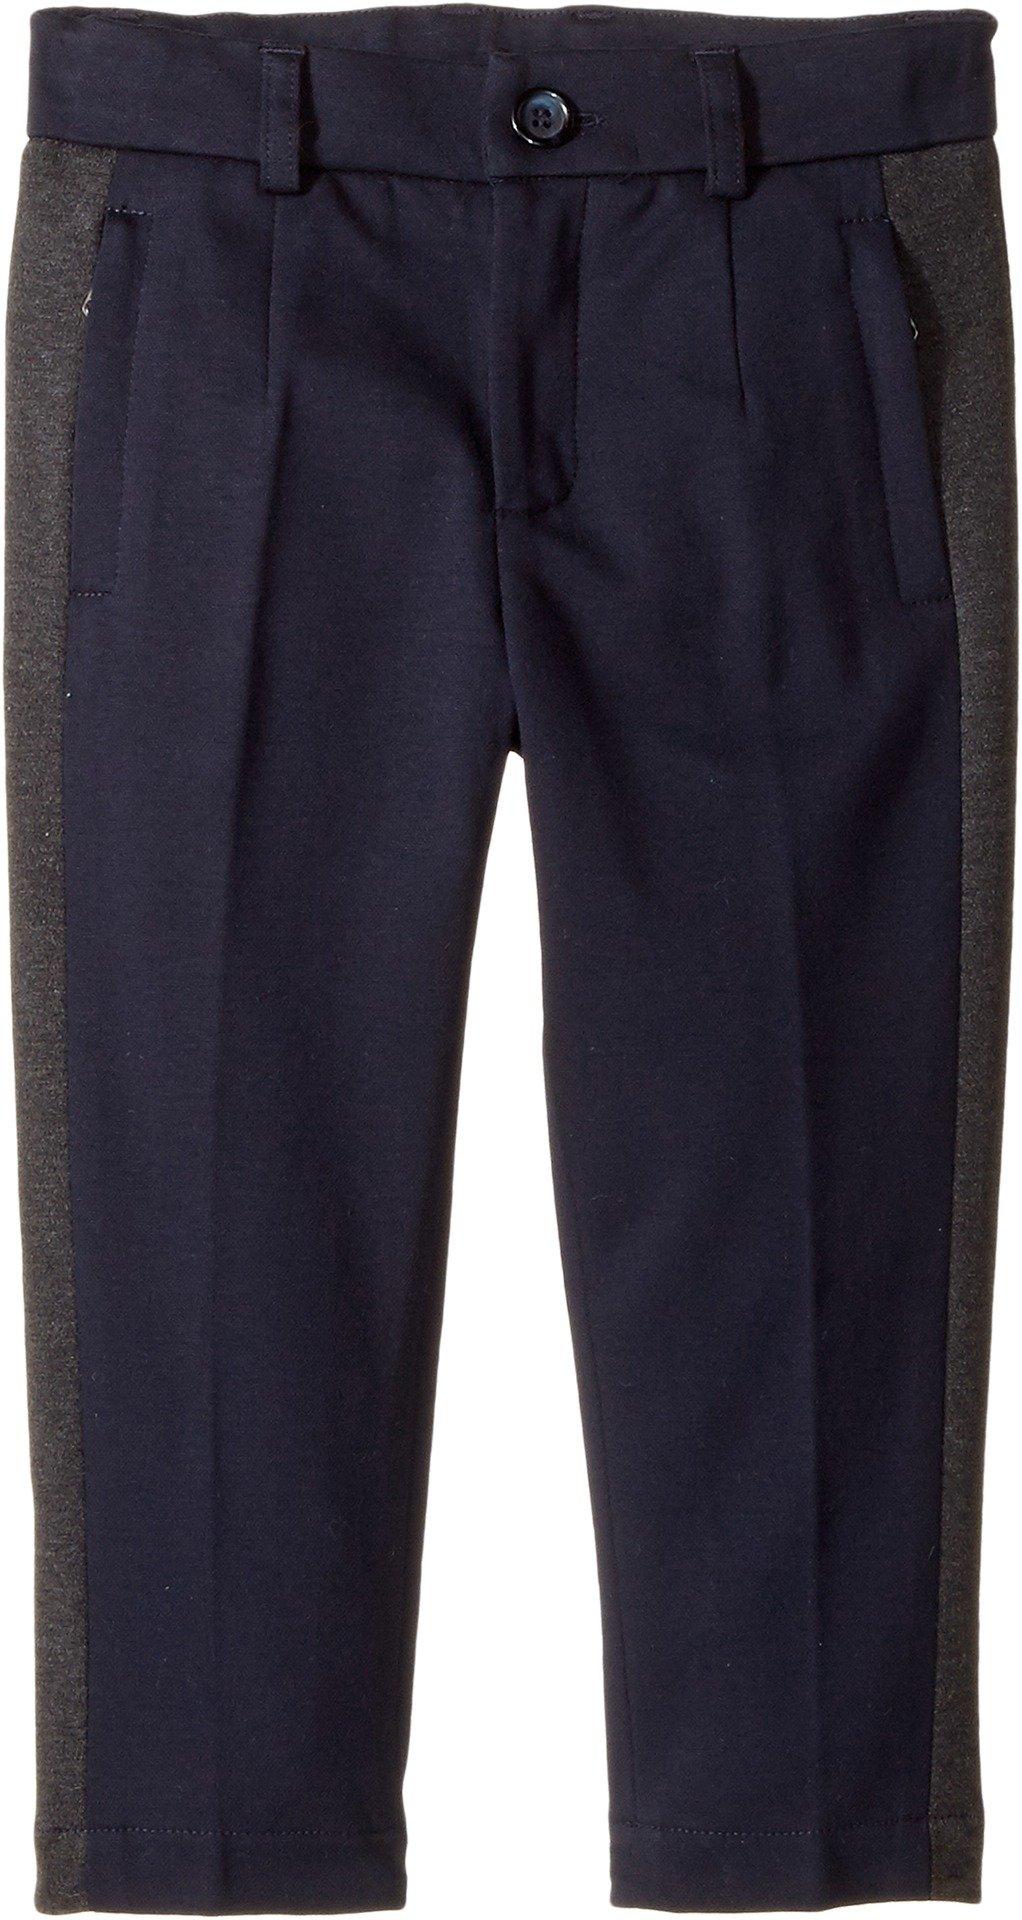 Dolce & Gabbana Kids  Baby Boy's Stretch Knit Pants (Toddler/Little Kids) Blue 4T Toddler